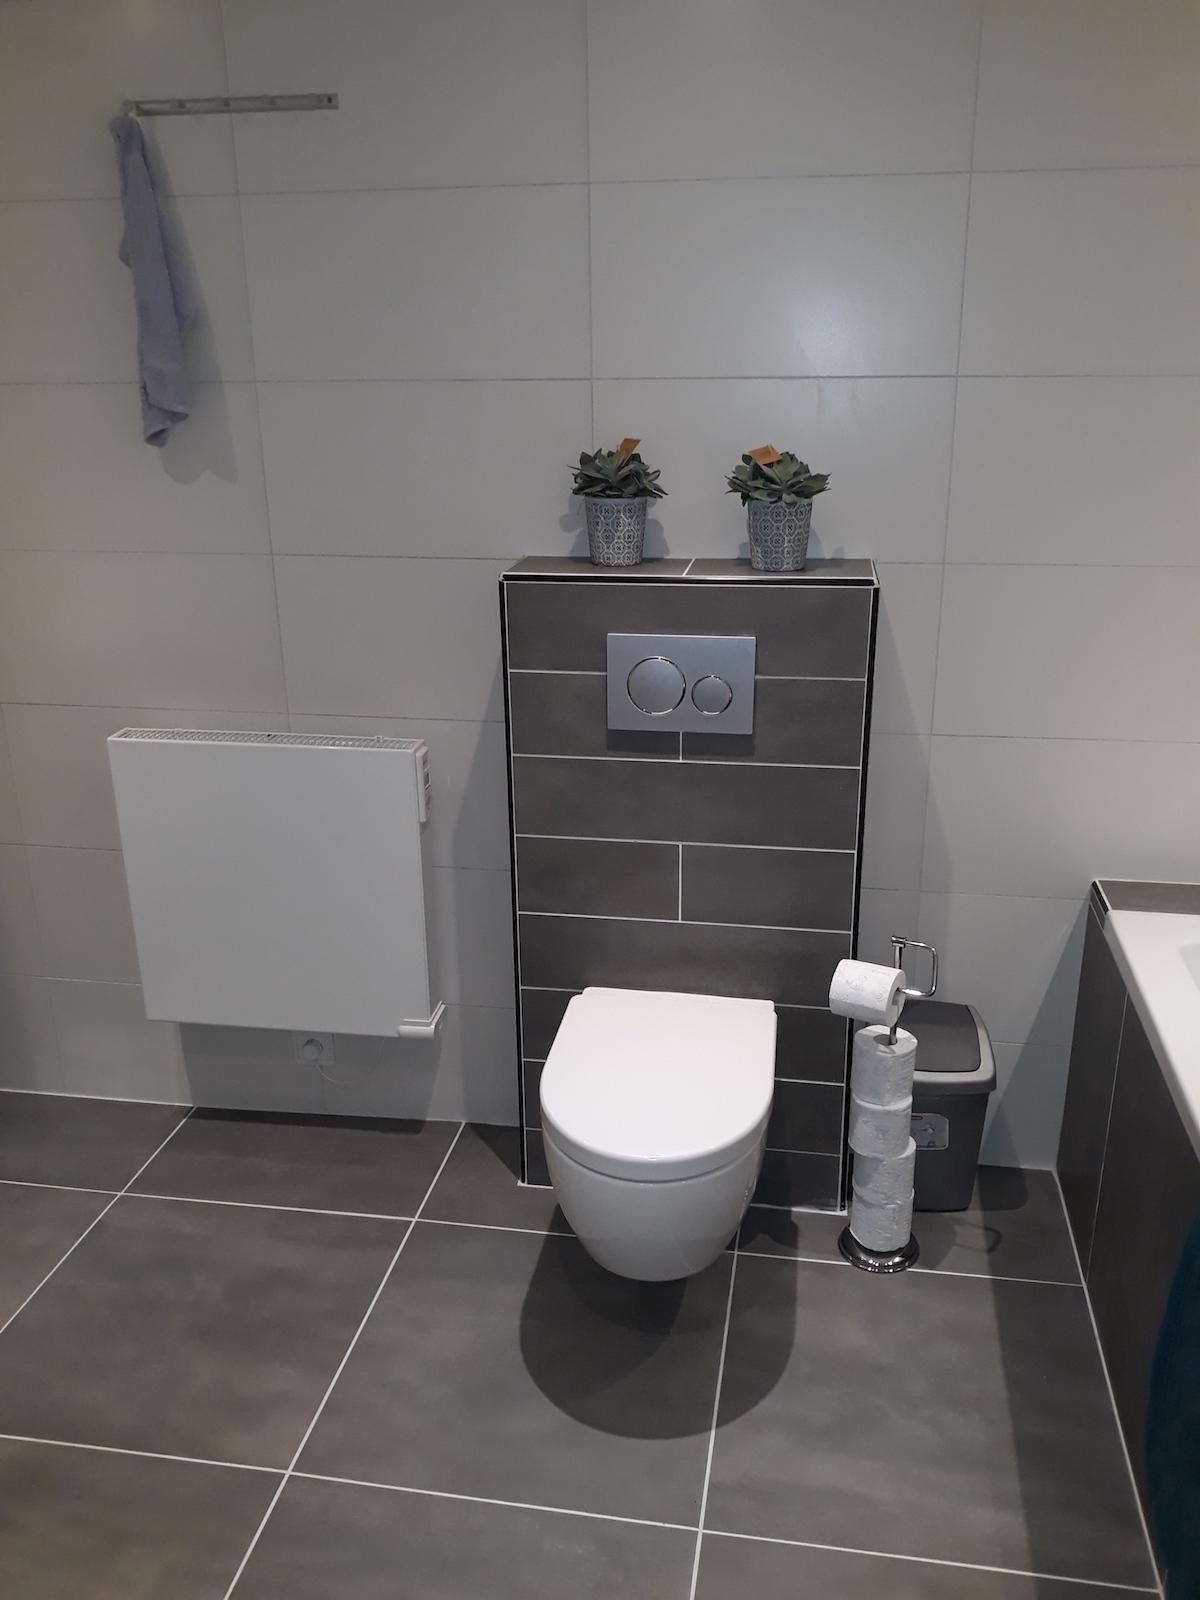 Onlangs uitgevoerd werk badkamer – Klusbedrijf PJ Mourits